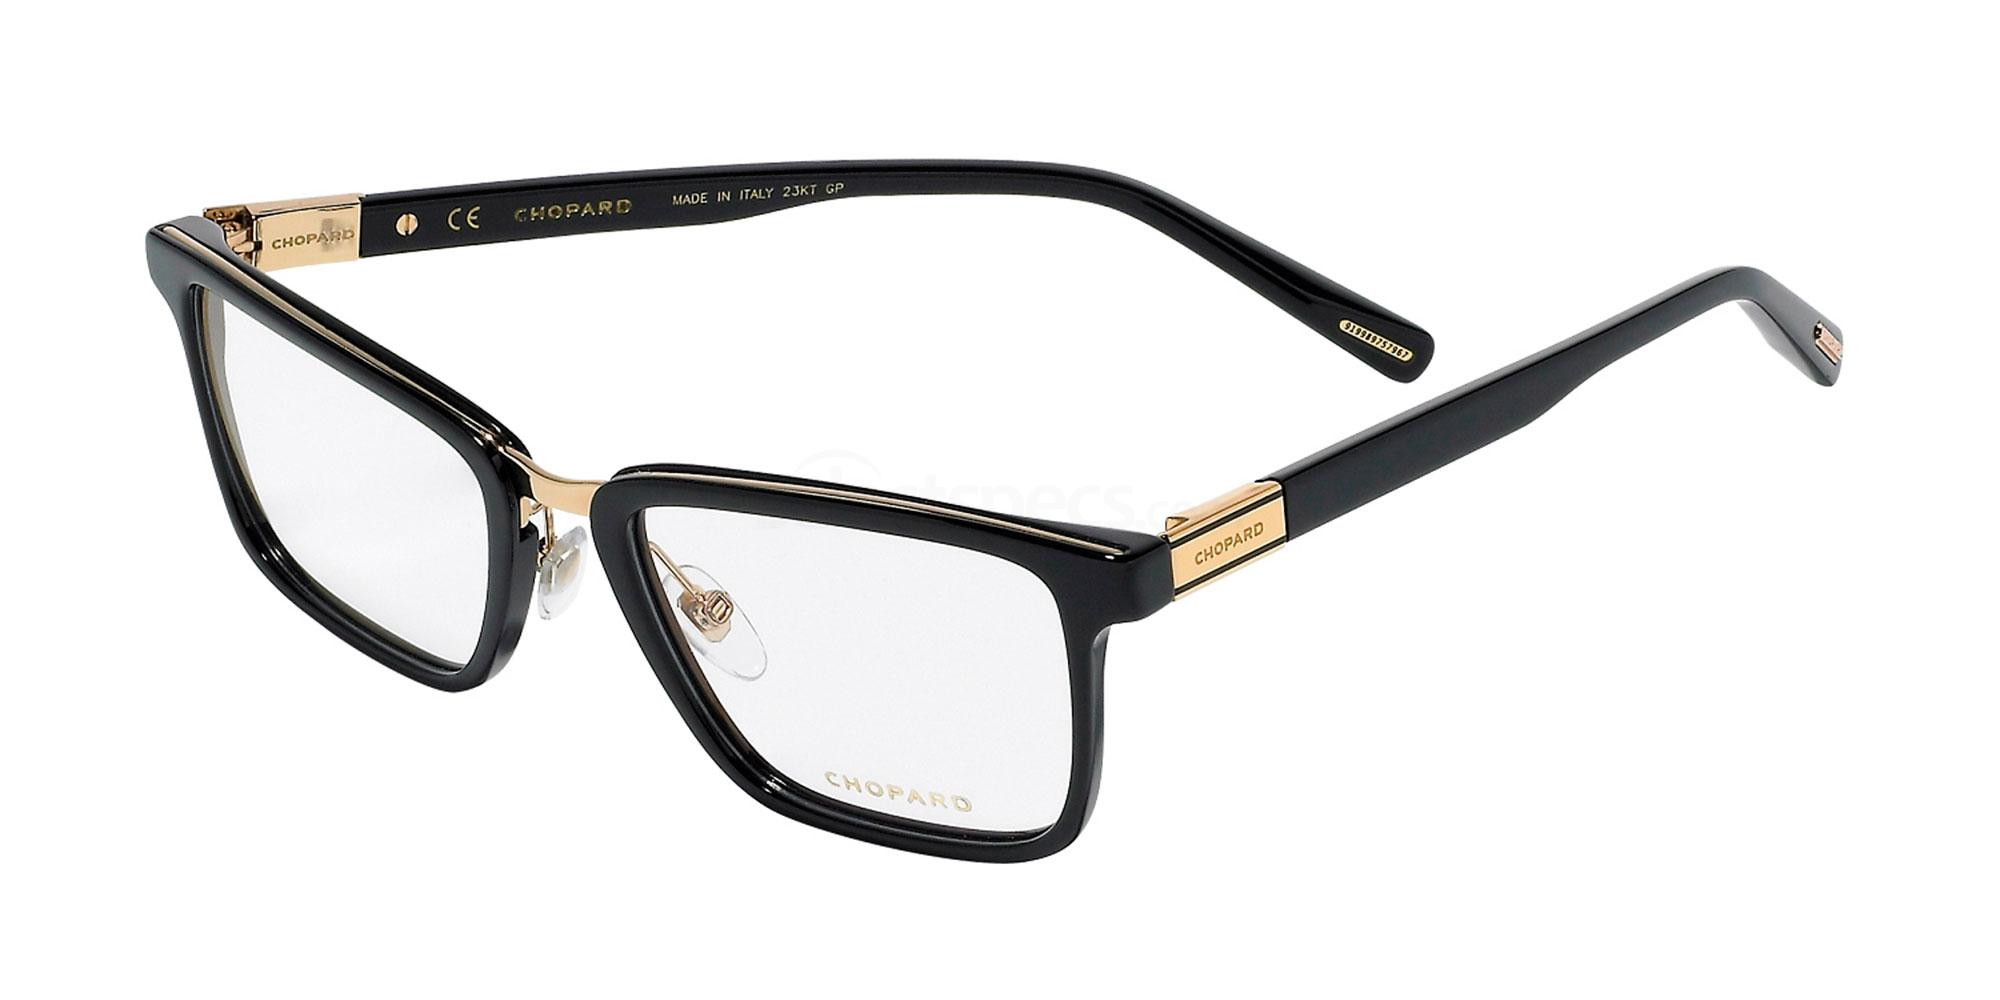 0700 VCH252 Glasses, Chopard